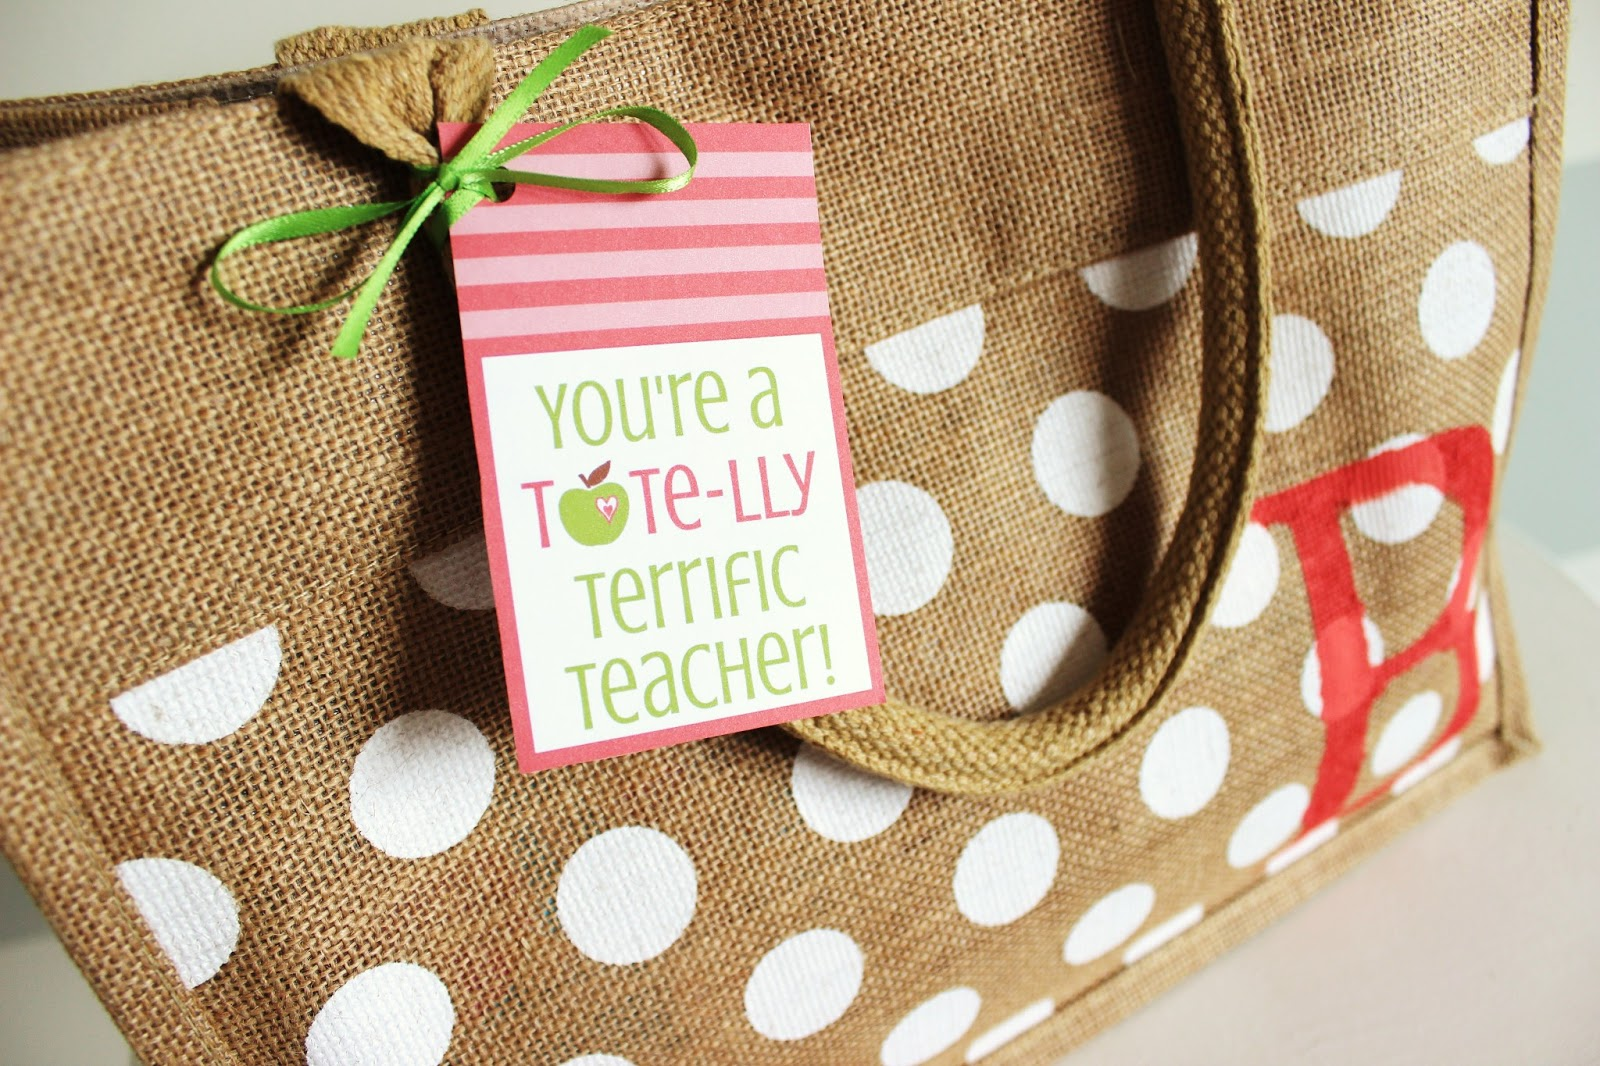 Teacher Appreciation Printable Tags… Tote-lly Terrific Gift